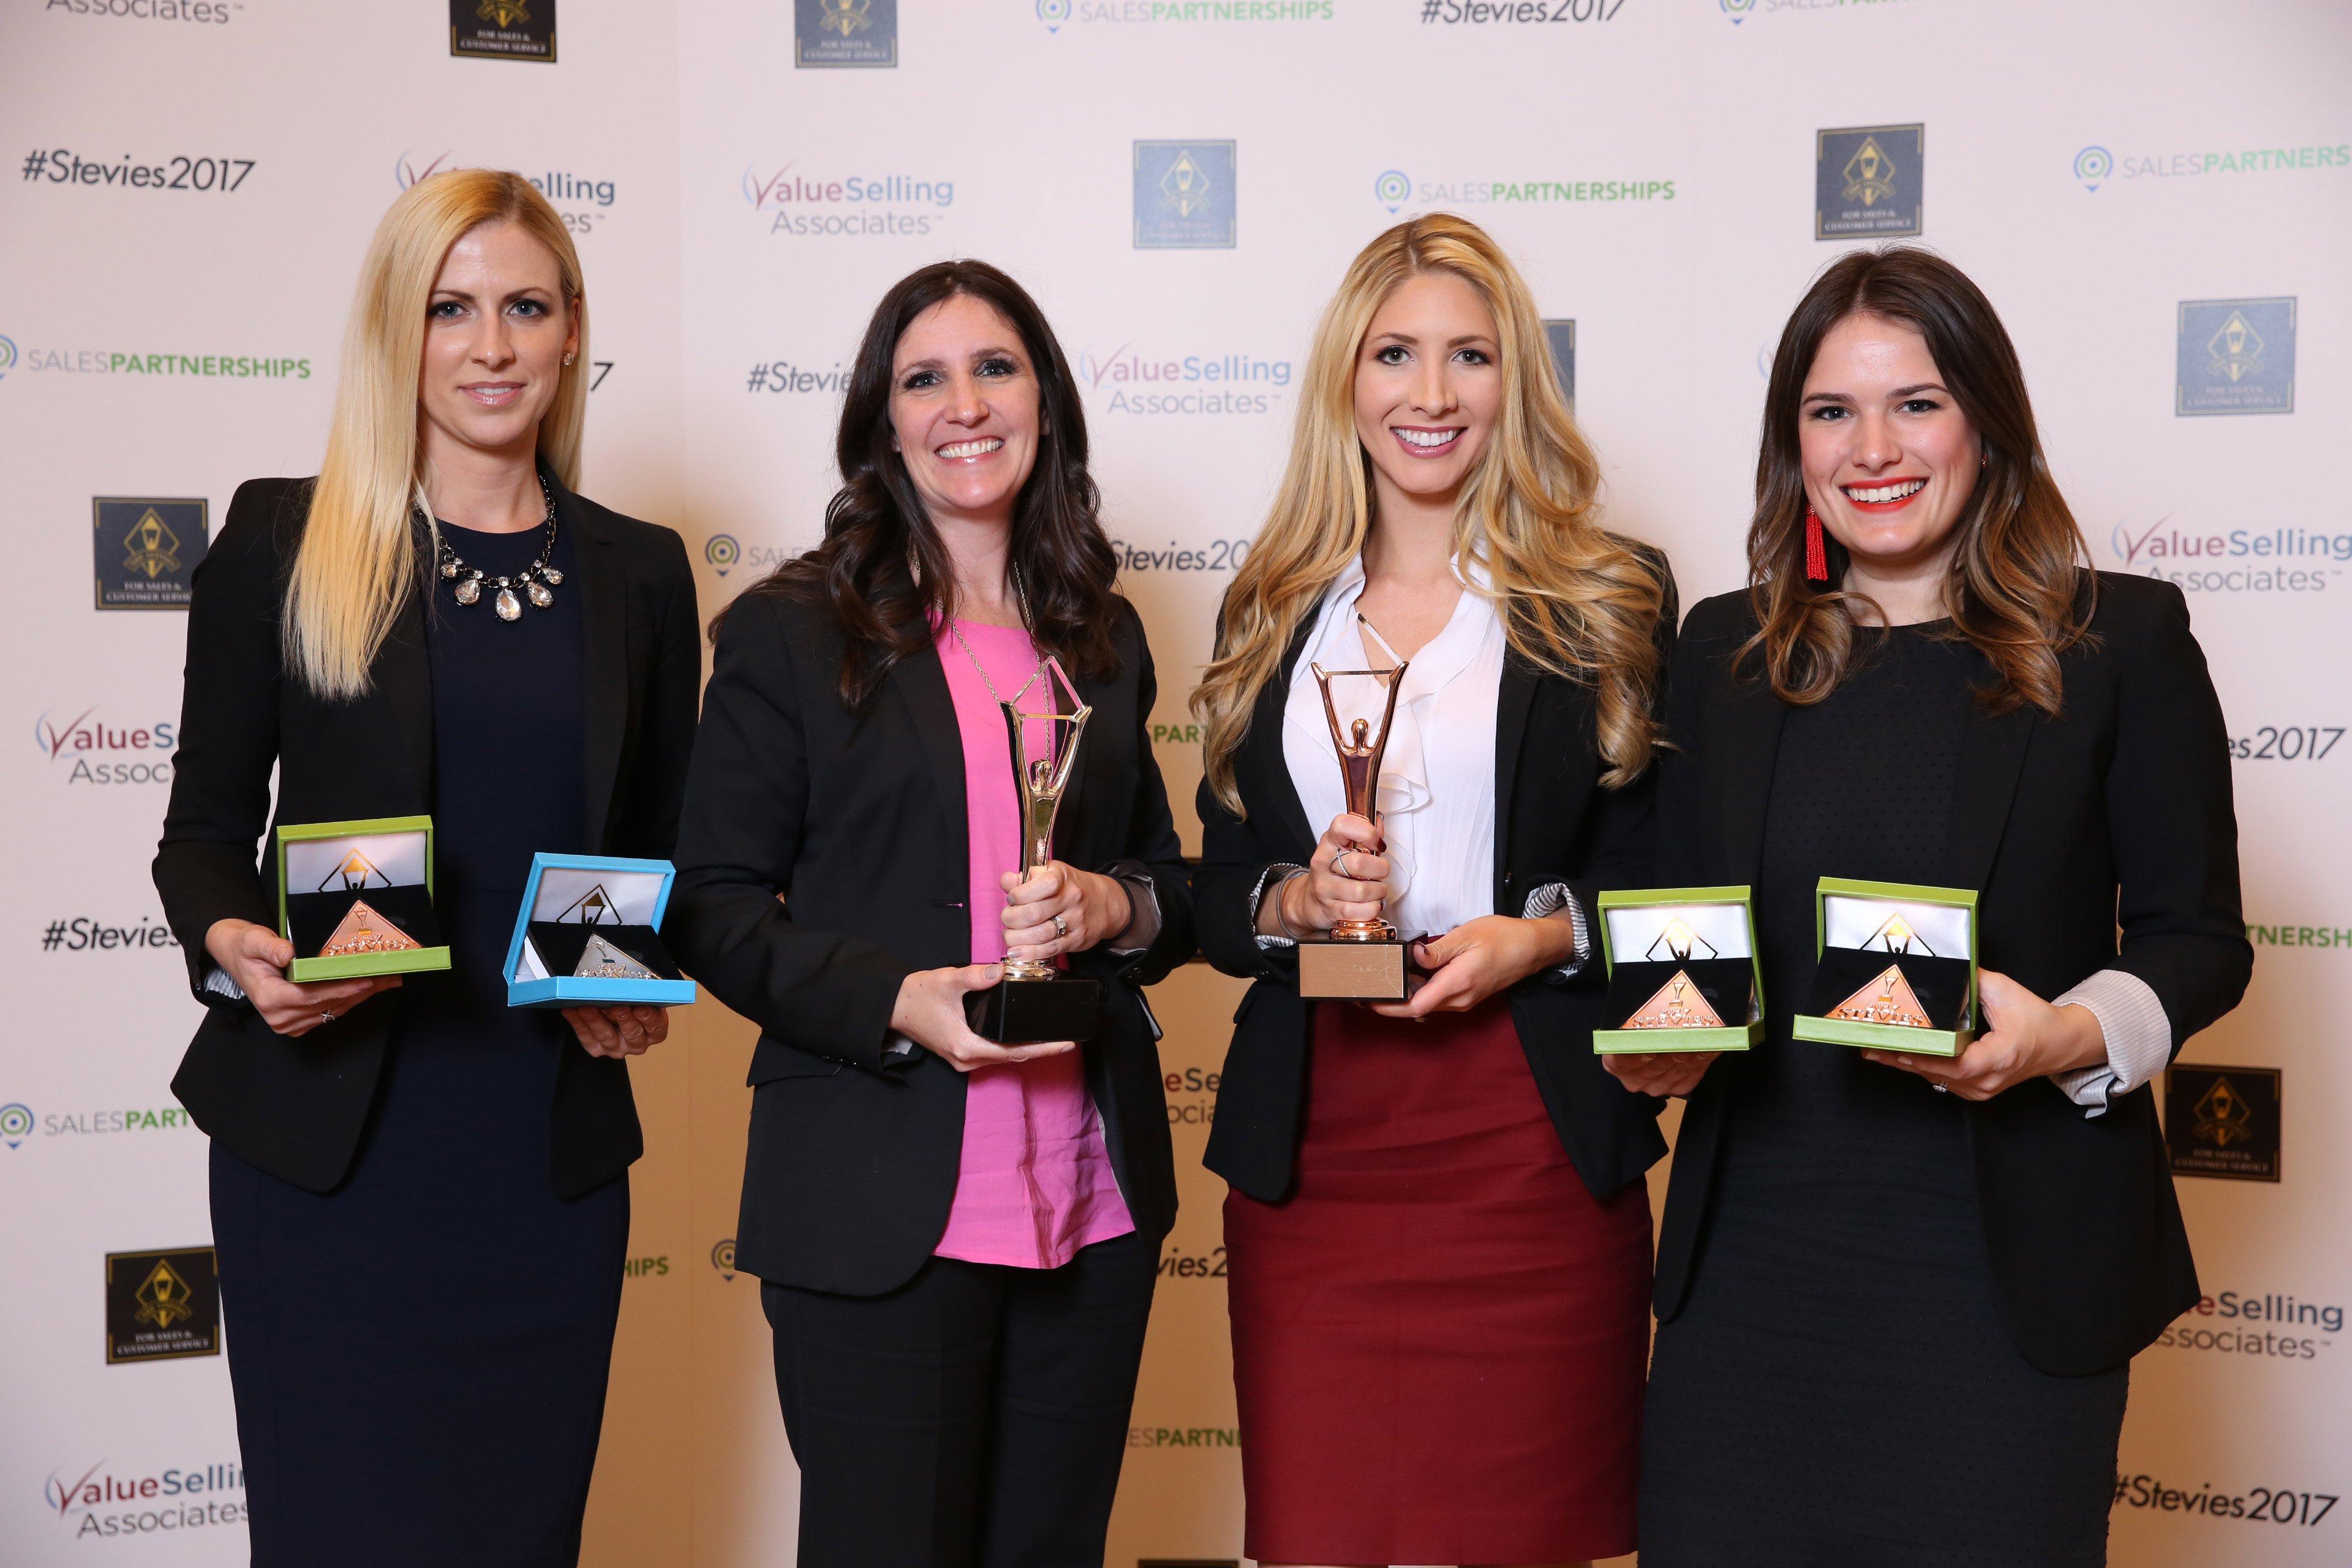 Stolze Gewinnerinnen der Stevie Awards for Sales and Customer Service 2017